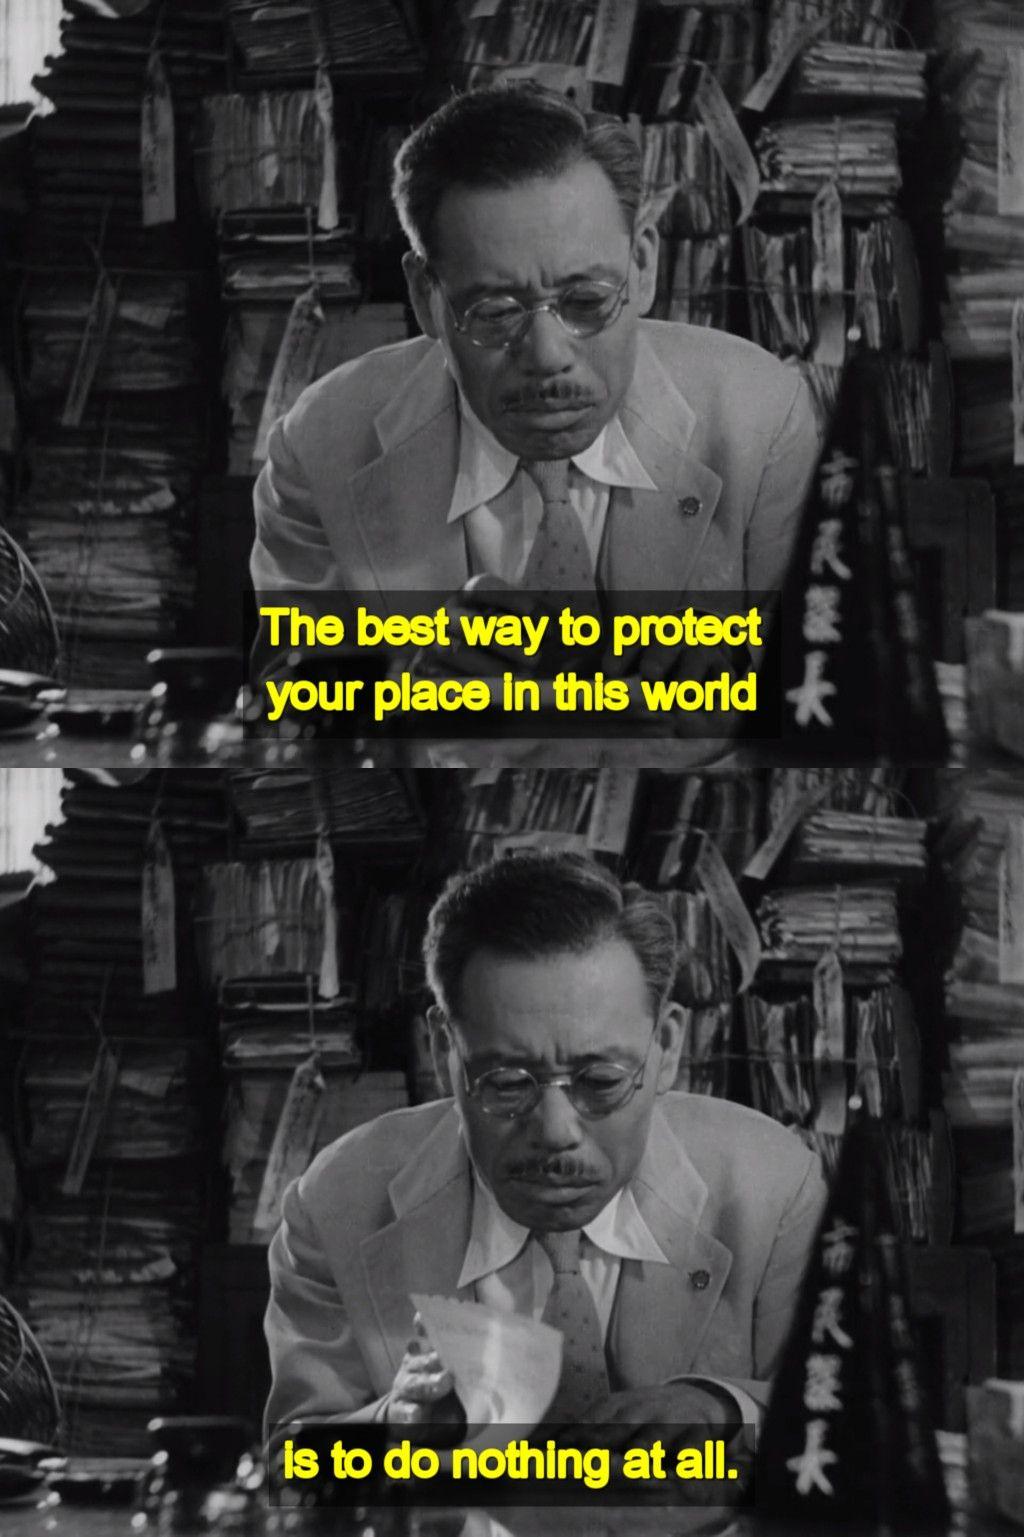 Ikiru 1952 By Akira Kurosawa Tv Series Quotes Movie Quotes Film Director